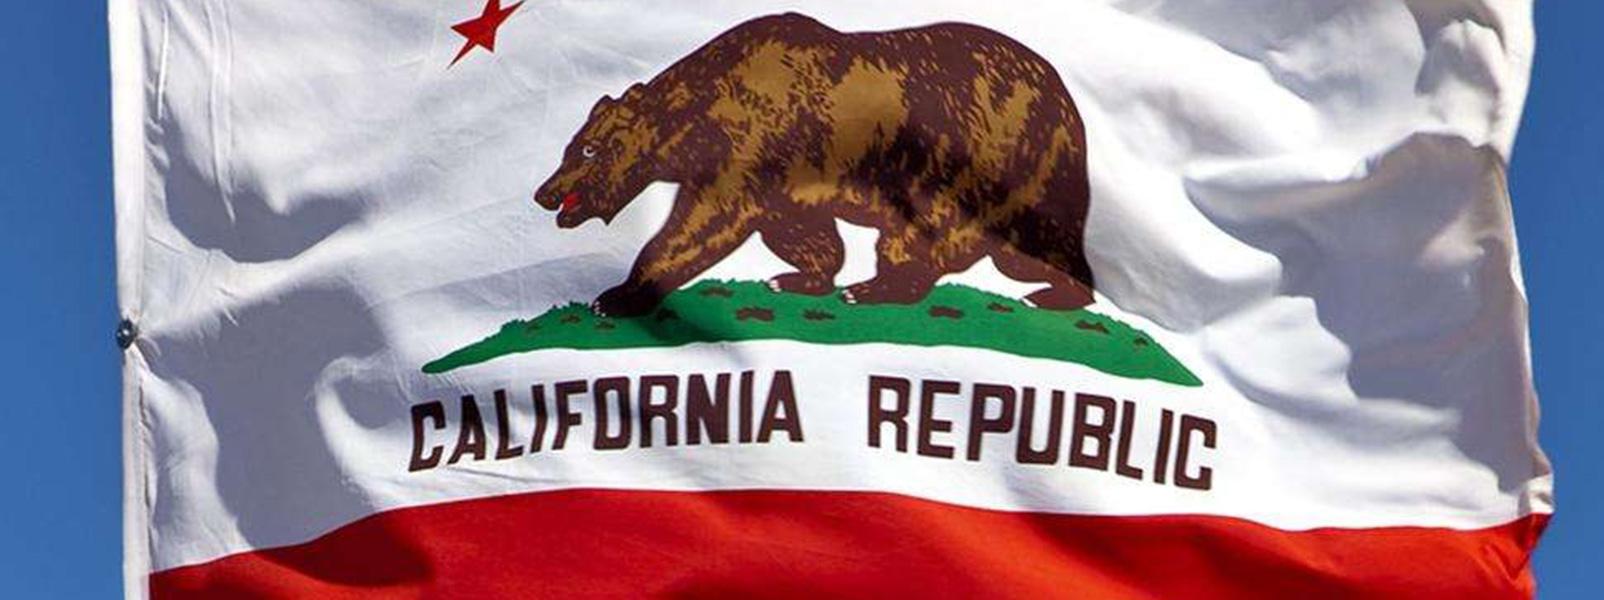 CALIFORNIA: SUPPRESSOR BILL SCHEDULED FOR HEARING